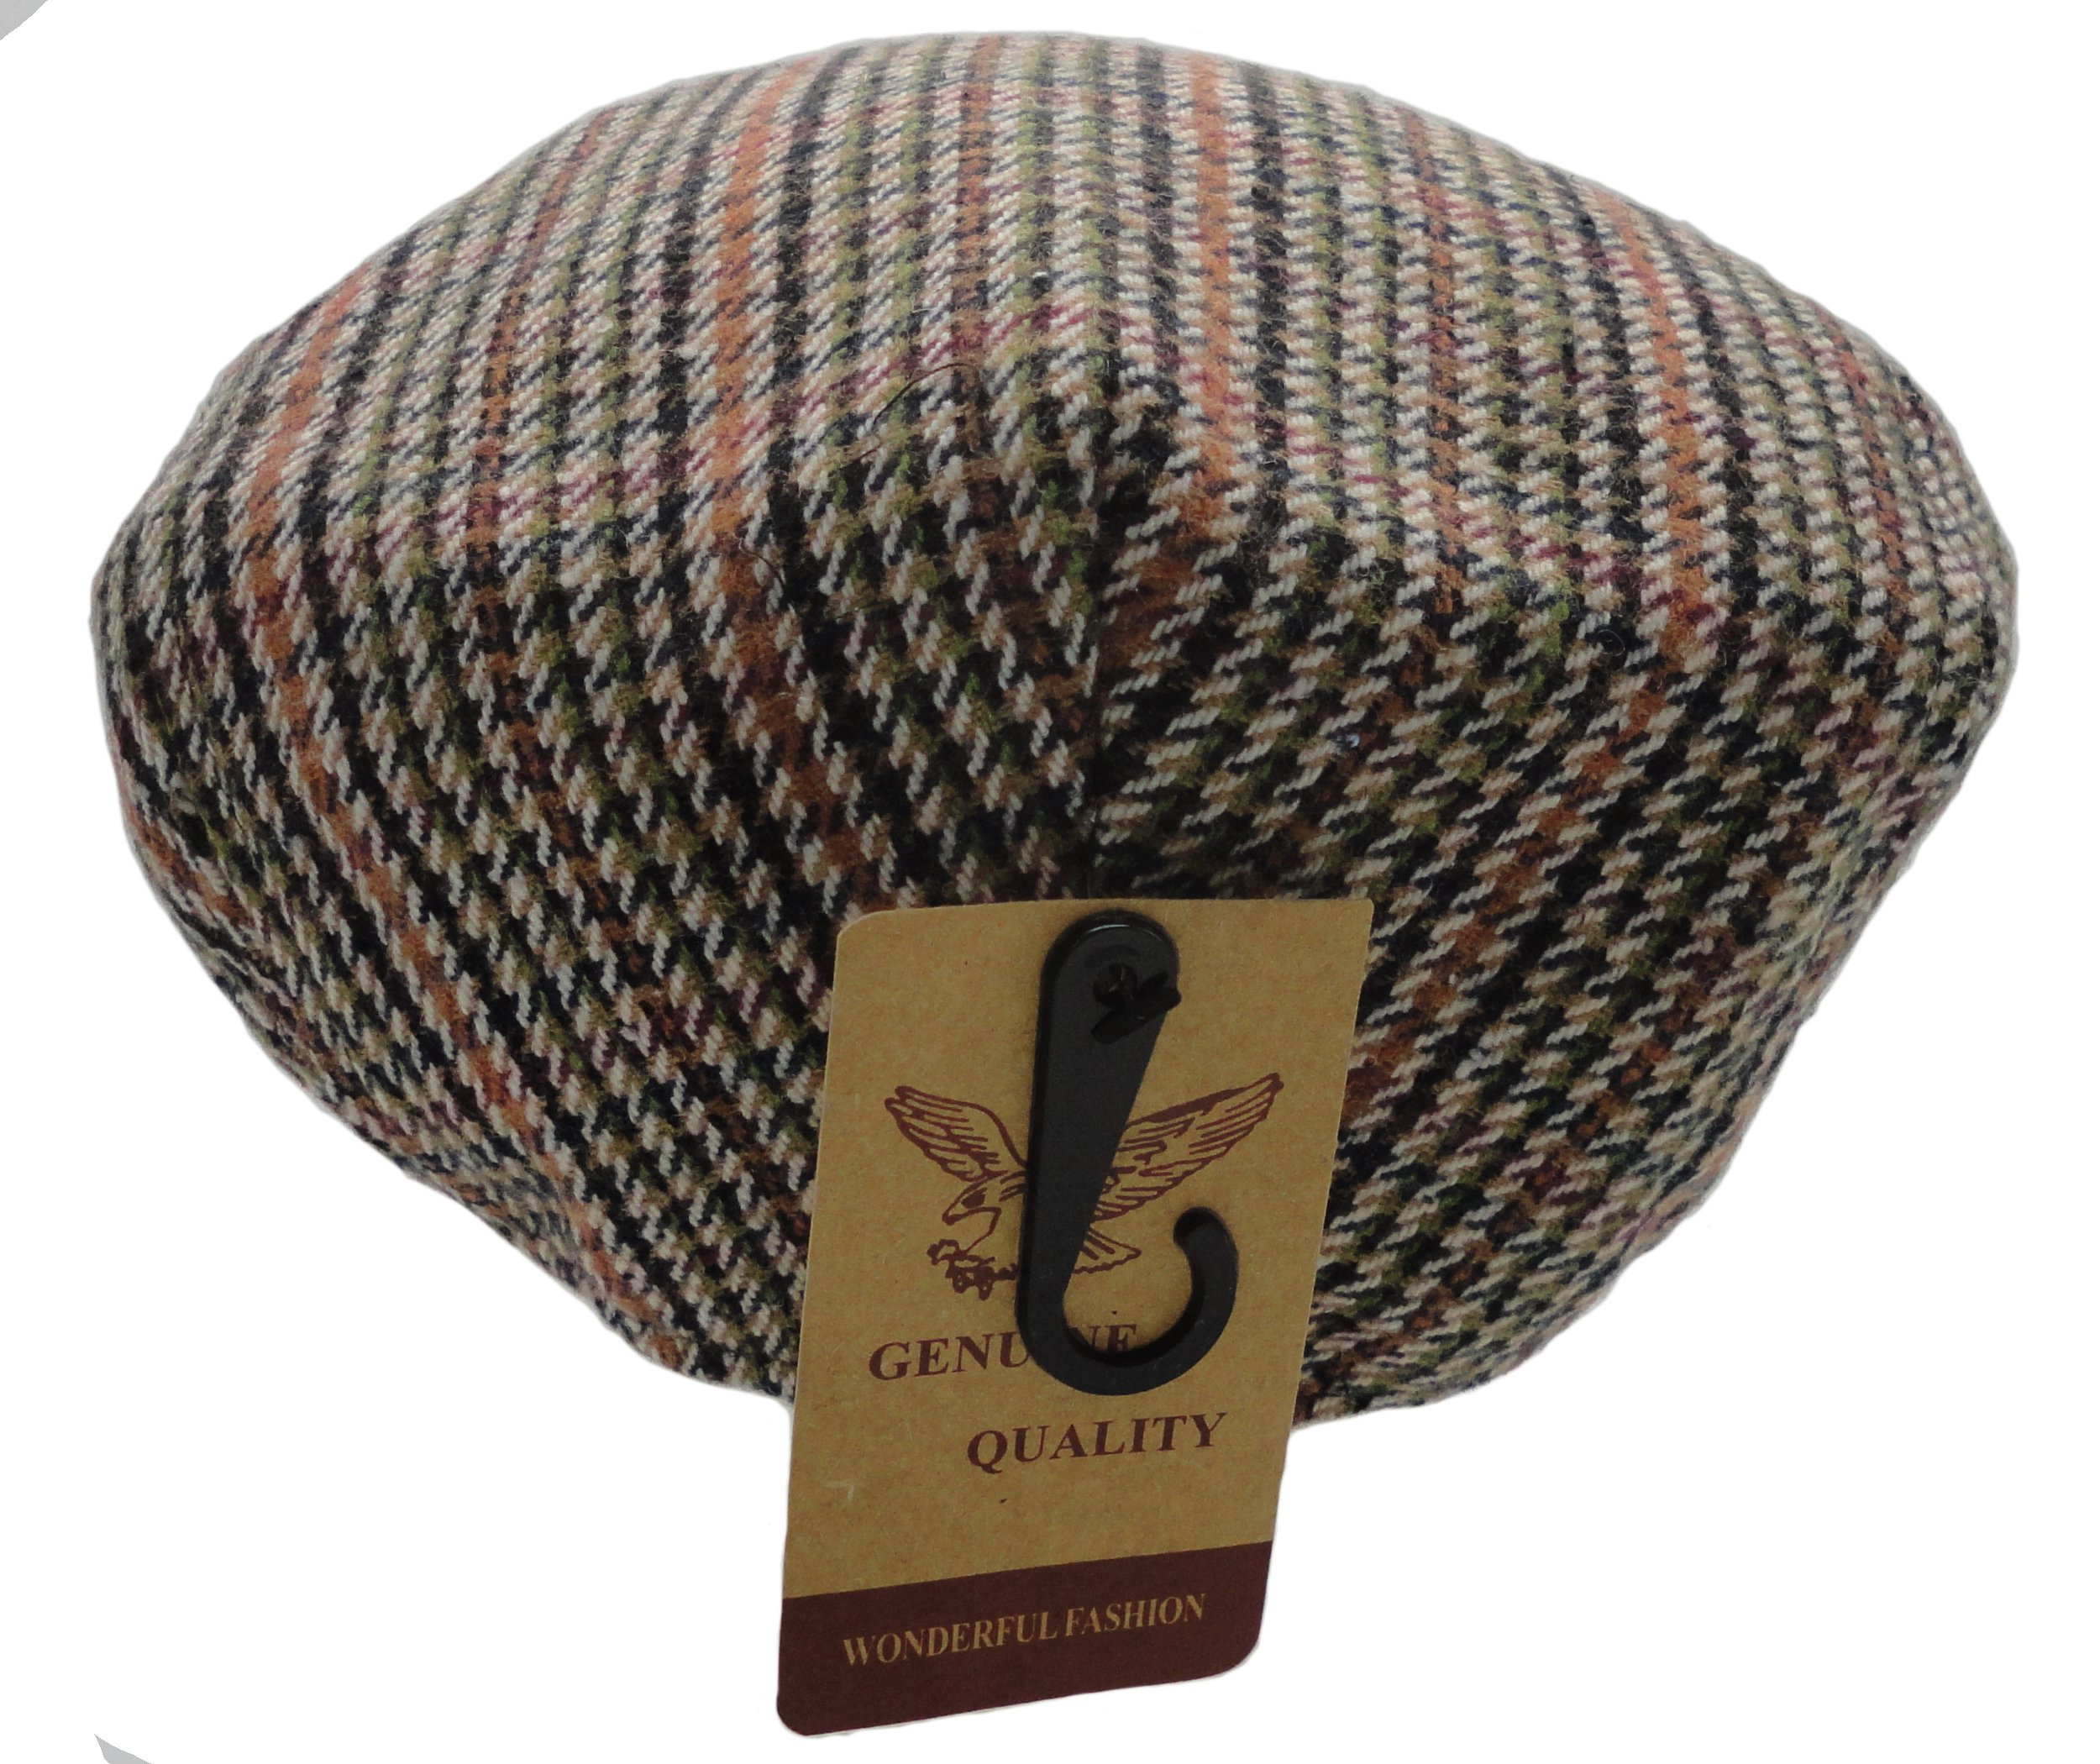 73e7c0c2d4a Wonderful Fashion Men s Classic Herringbone Tweed Wool Blend Newsboy Ivy Hat  (S M